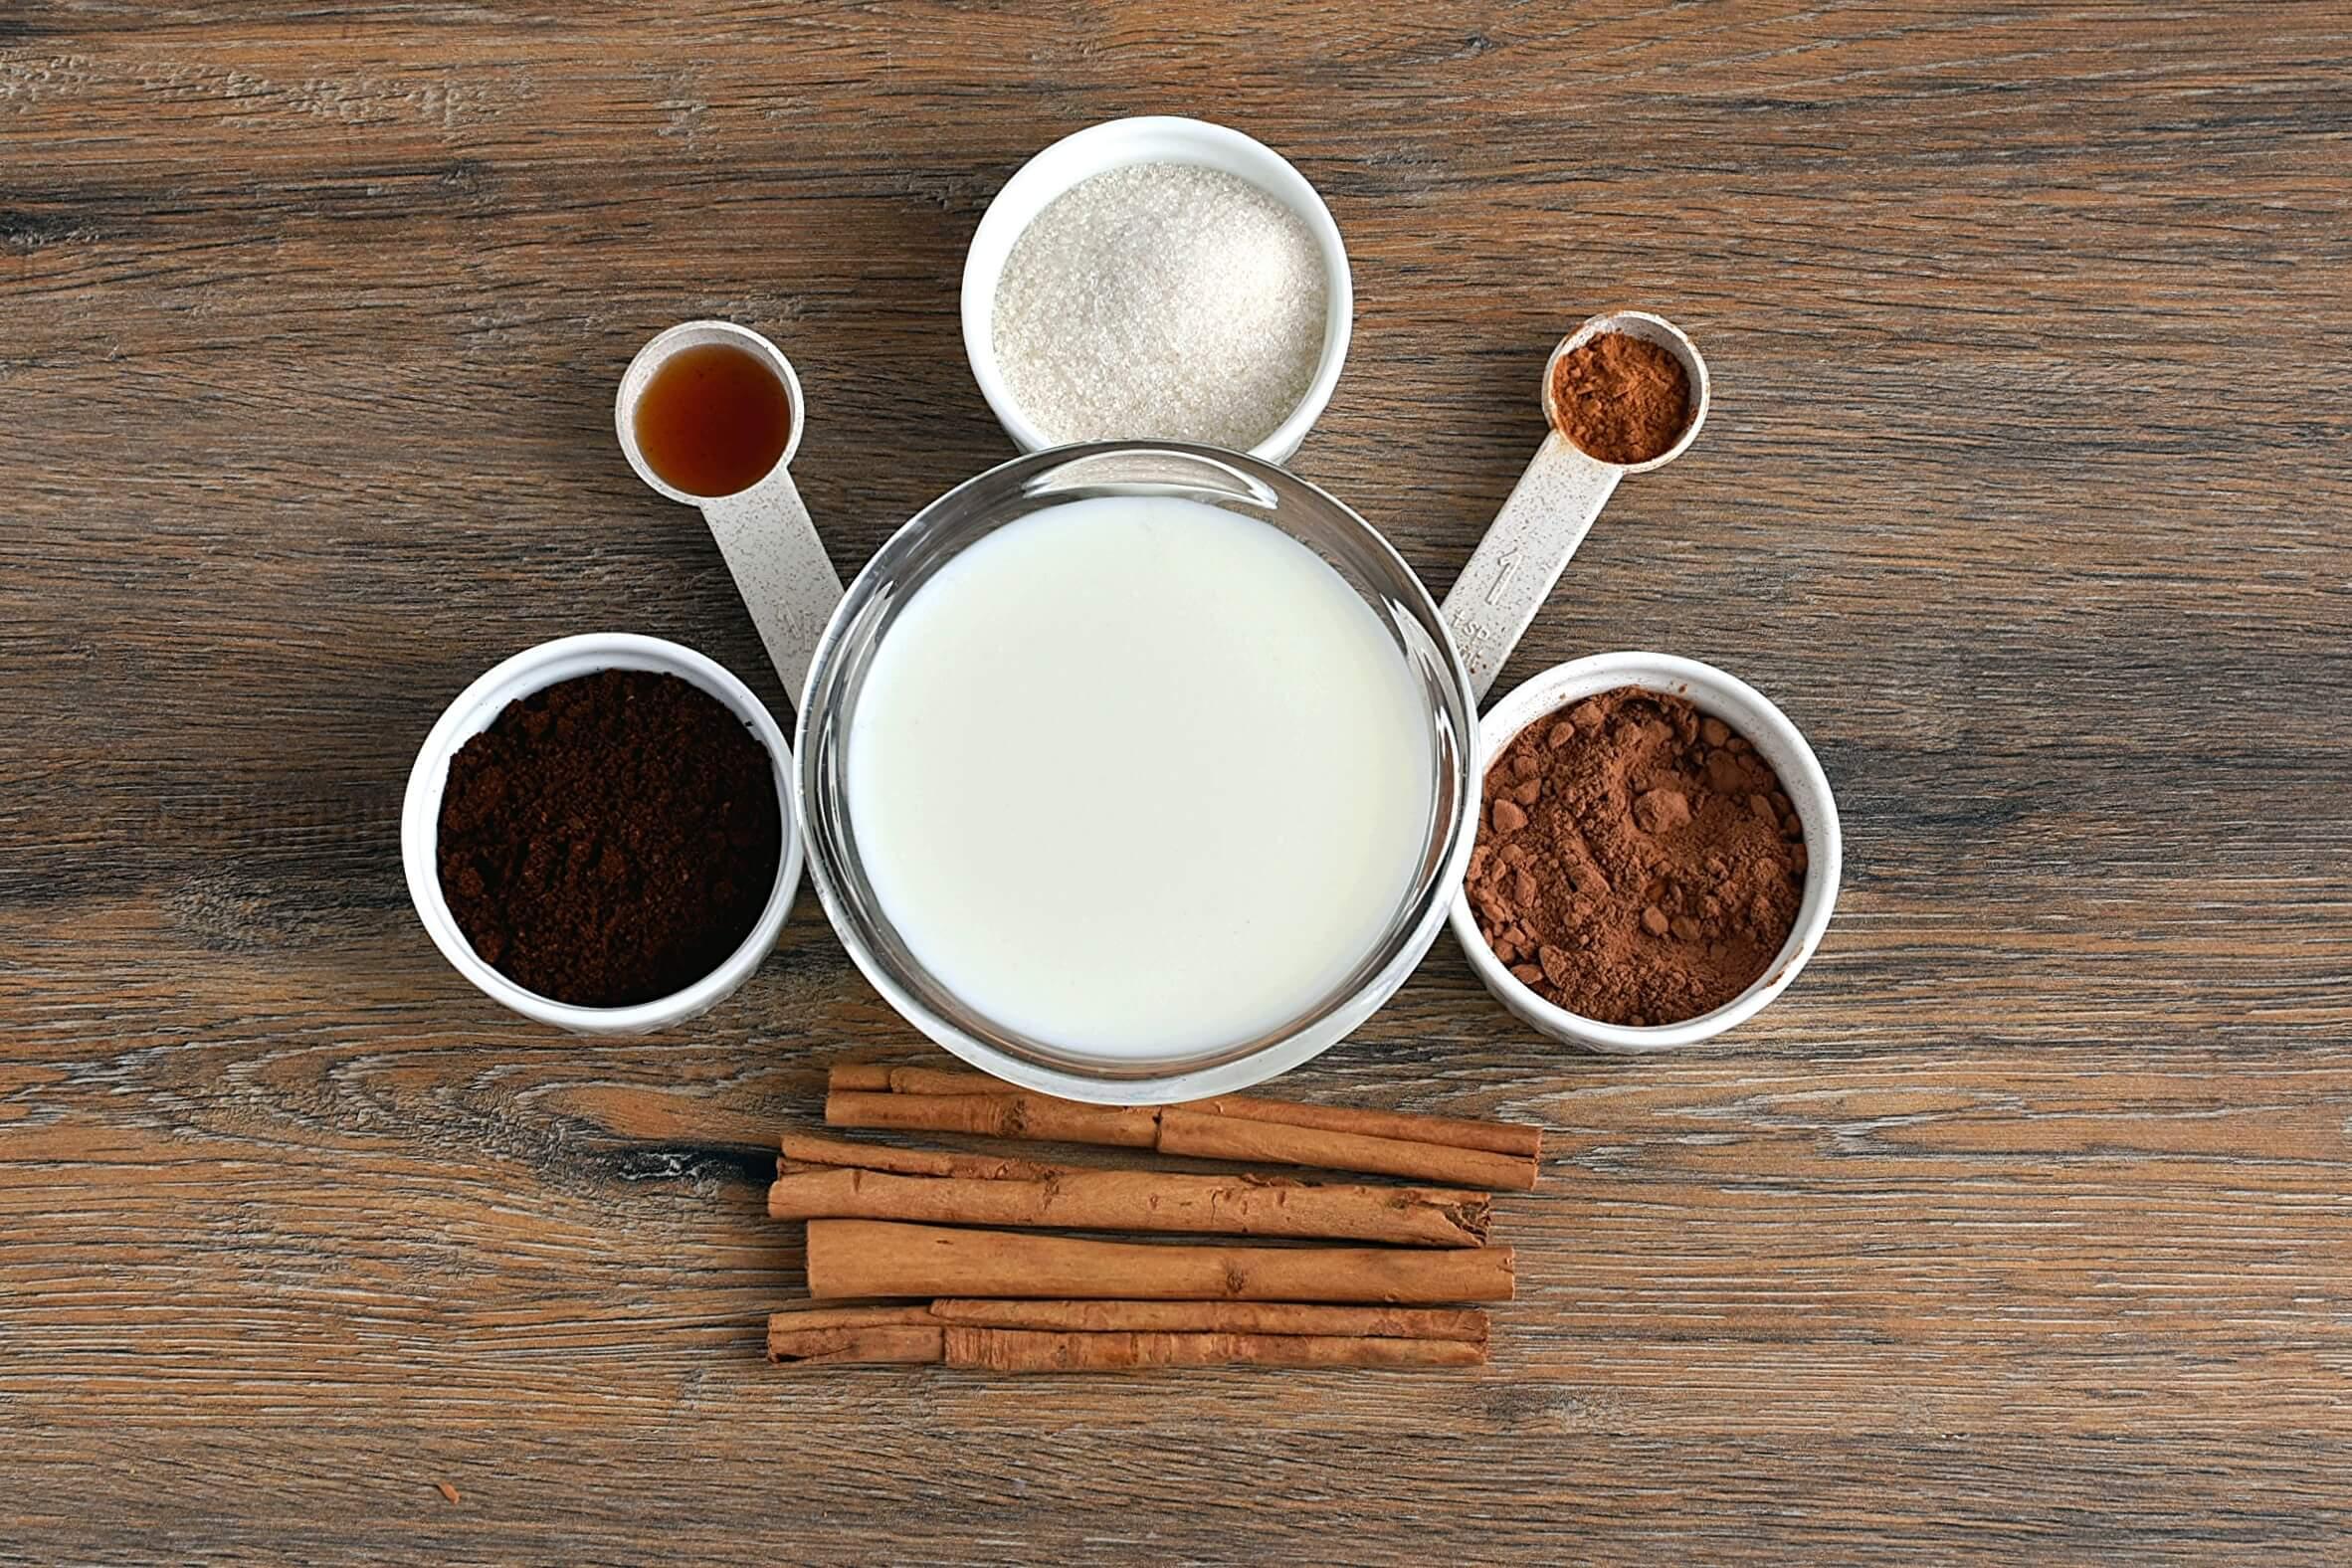 Cinnamon Mocha Coffee Recipe-How To Make Cinnamon Mocha Coffee-Delicious Cinnamon Mocha Coffee